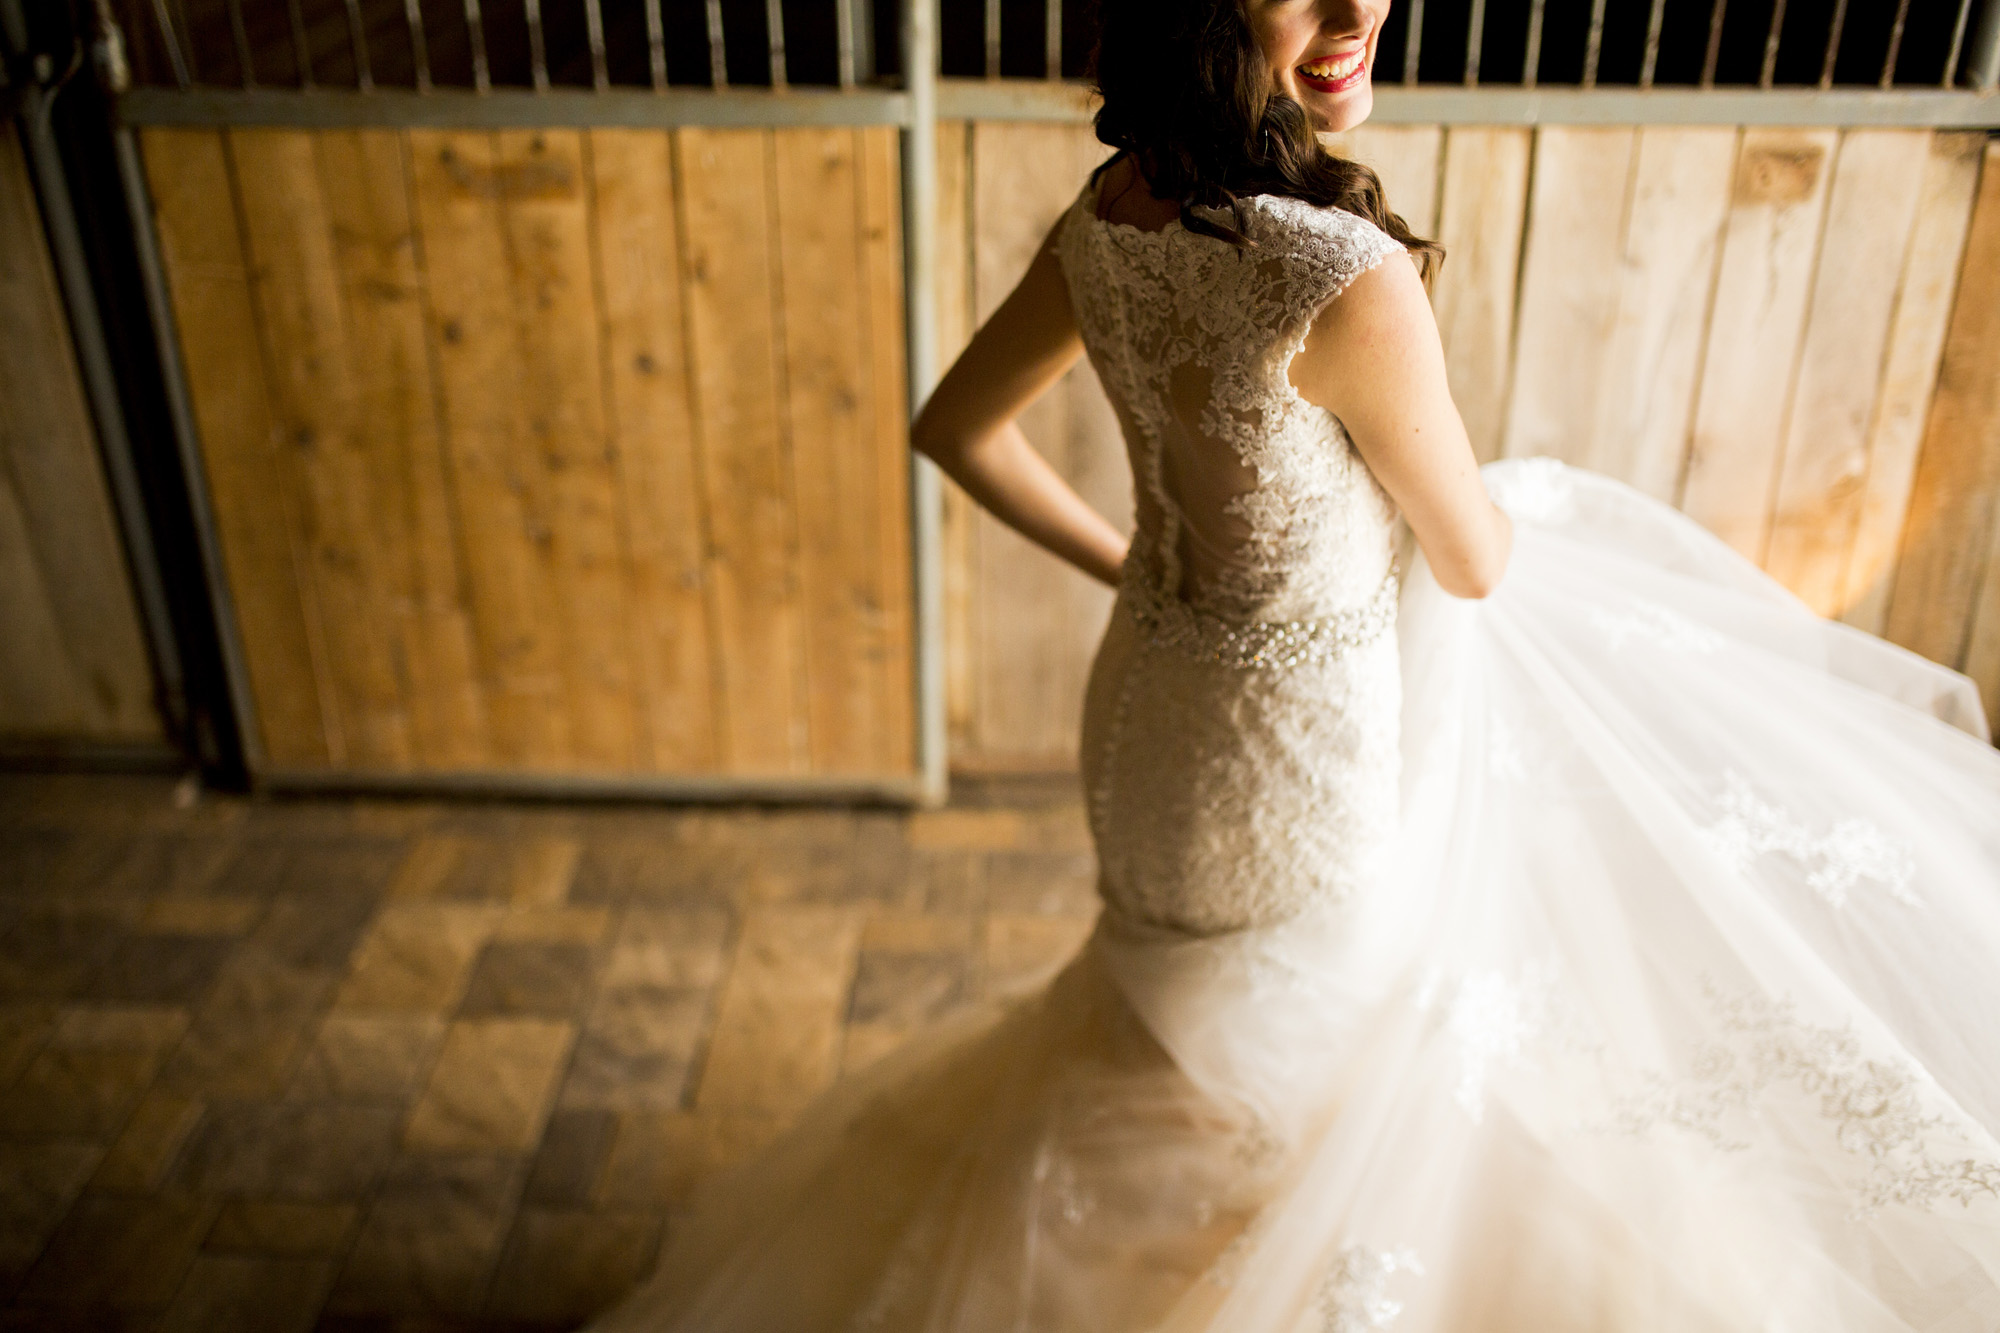 Seriously_Sabrina_Photography_Bowling_Green_Kentucky_Highland_Stables_Wedding_Wolff19.jpg